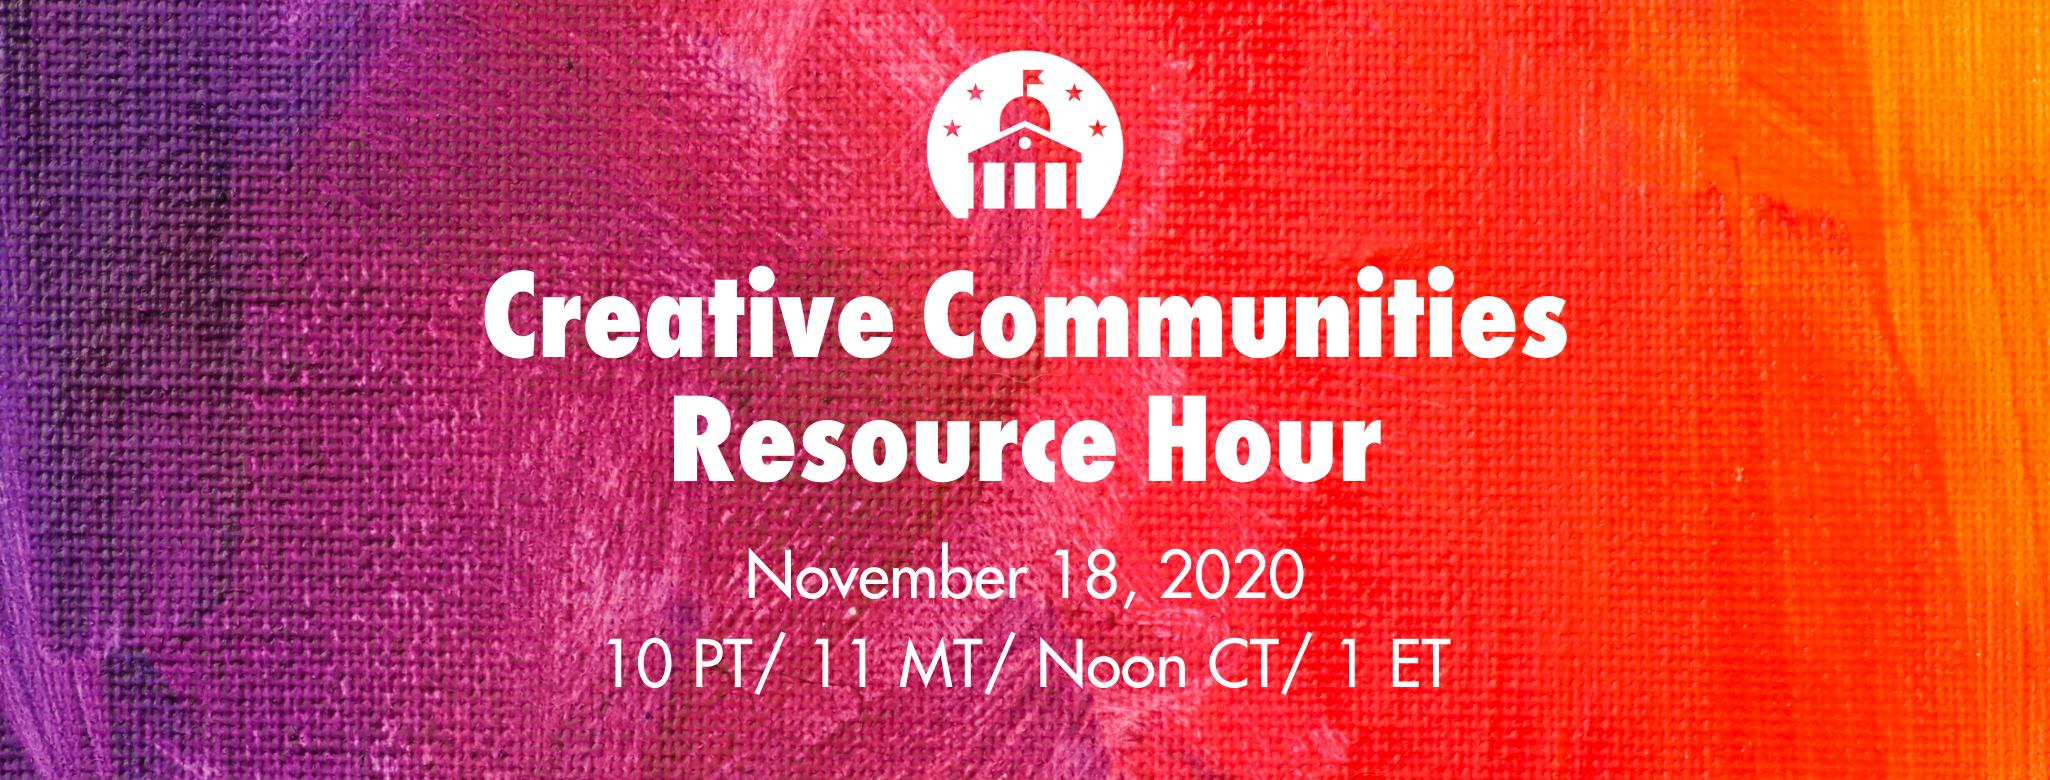 creative communities resource hour